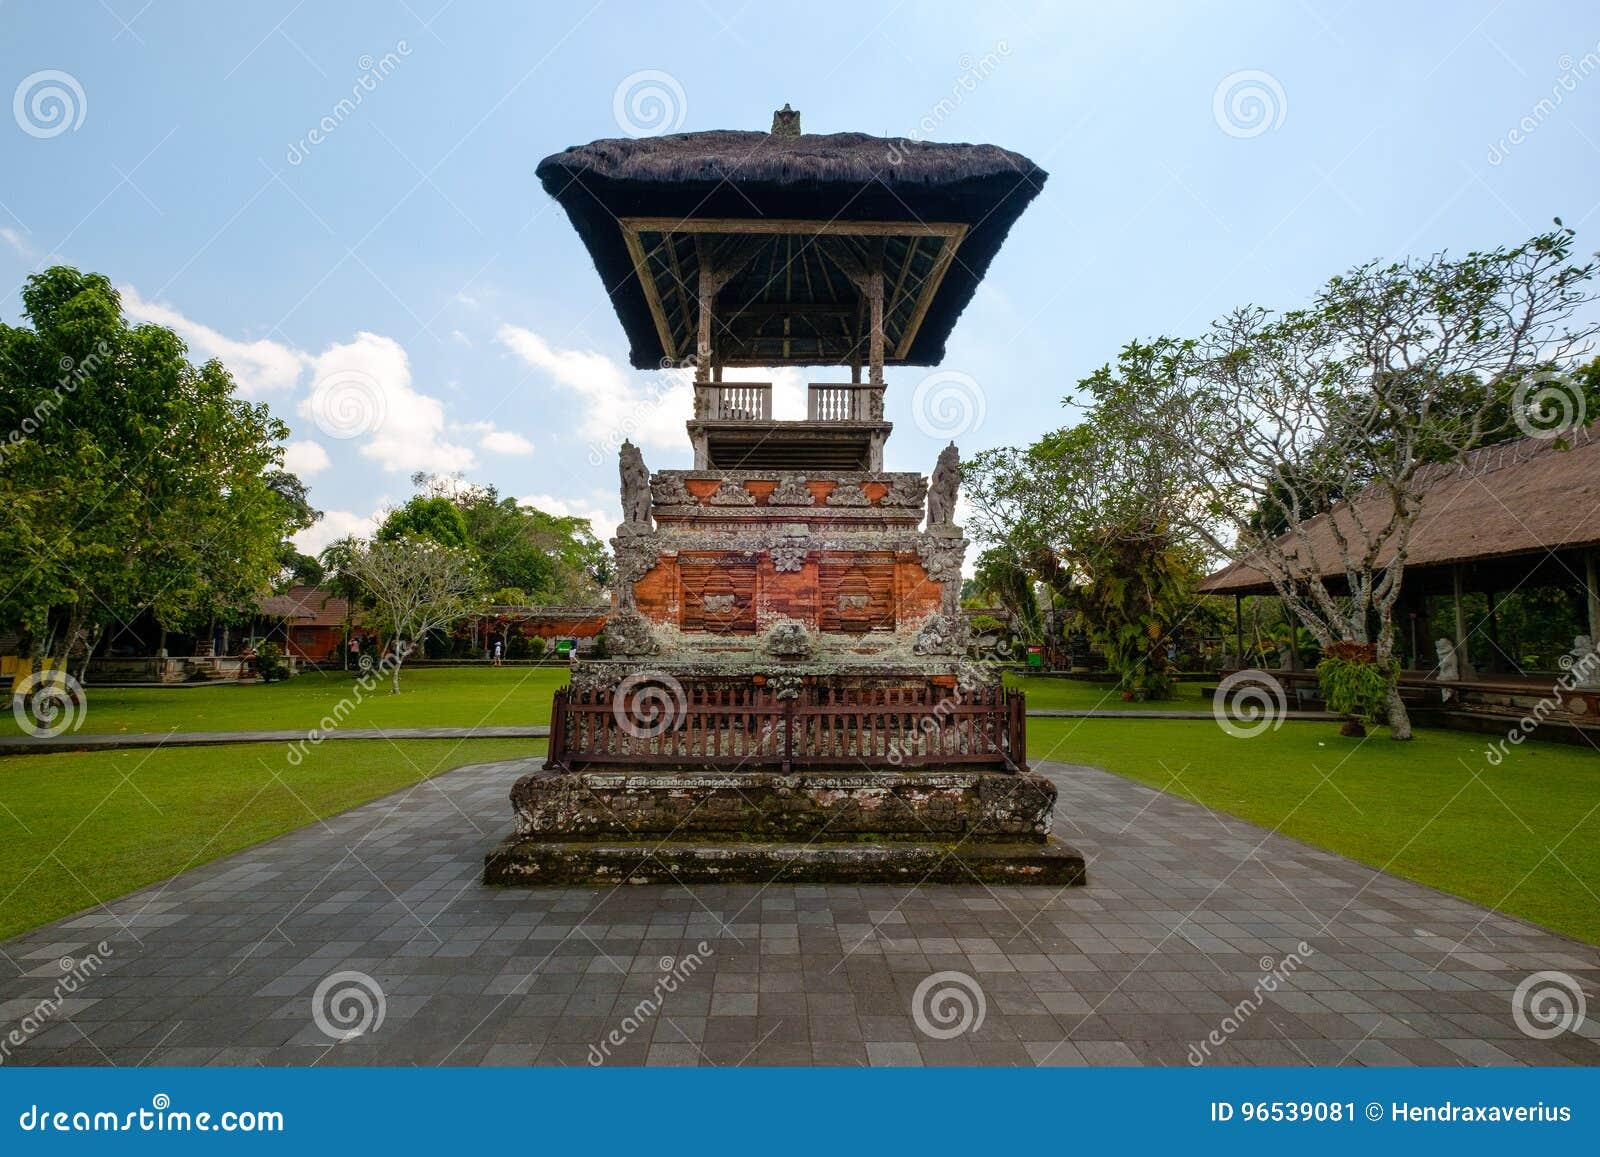 Santuário do altar rezando do Hinduísmo do Balinese